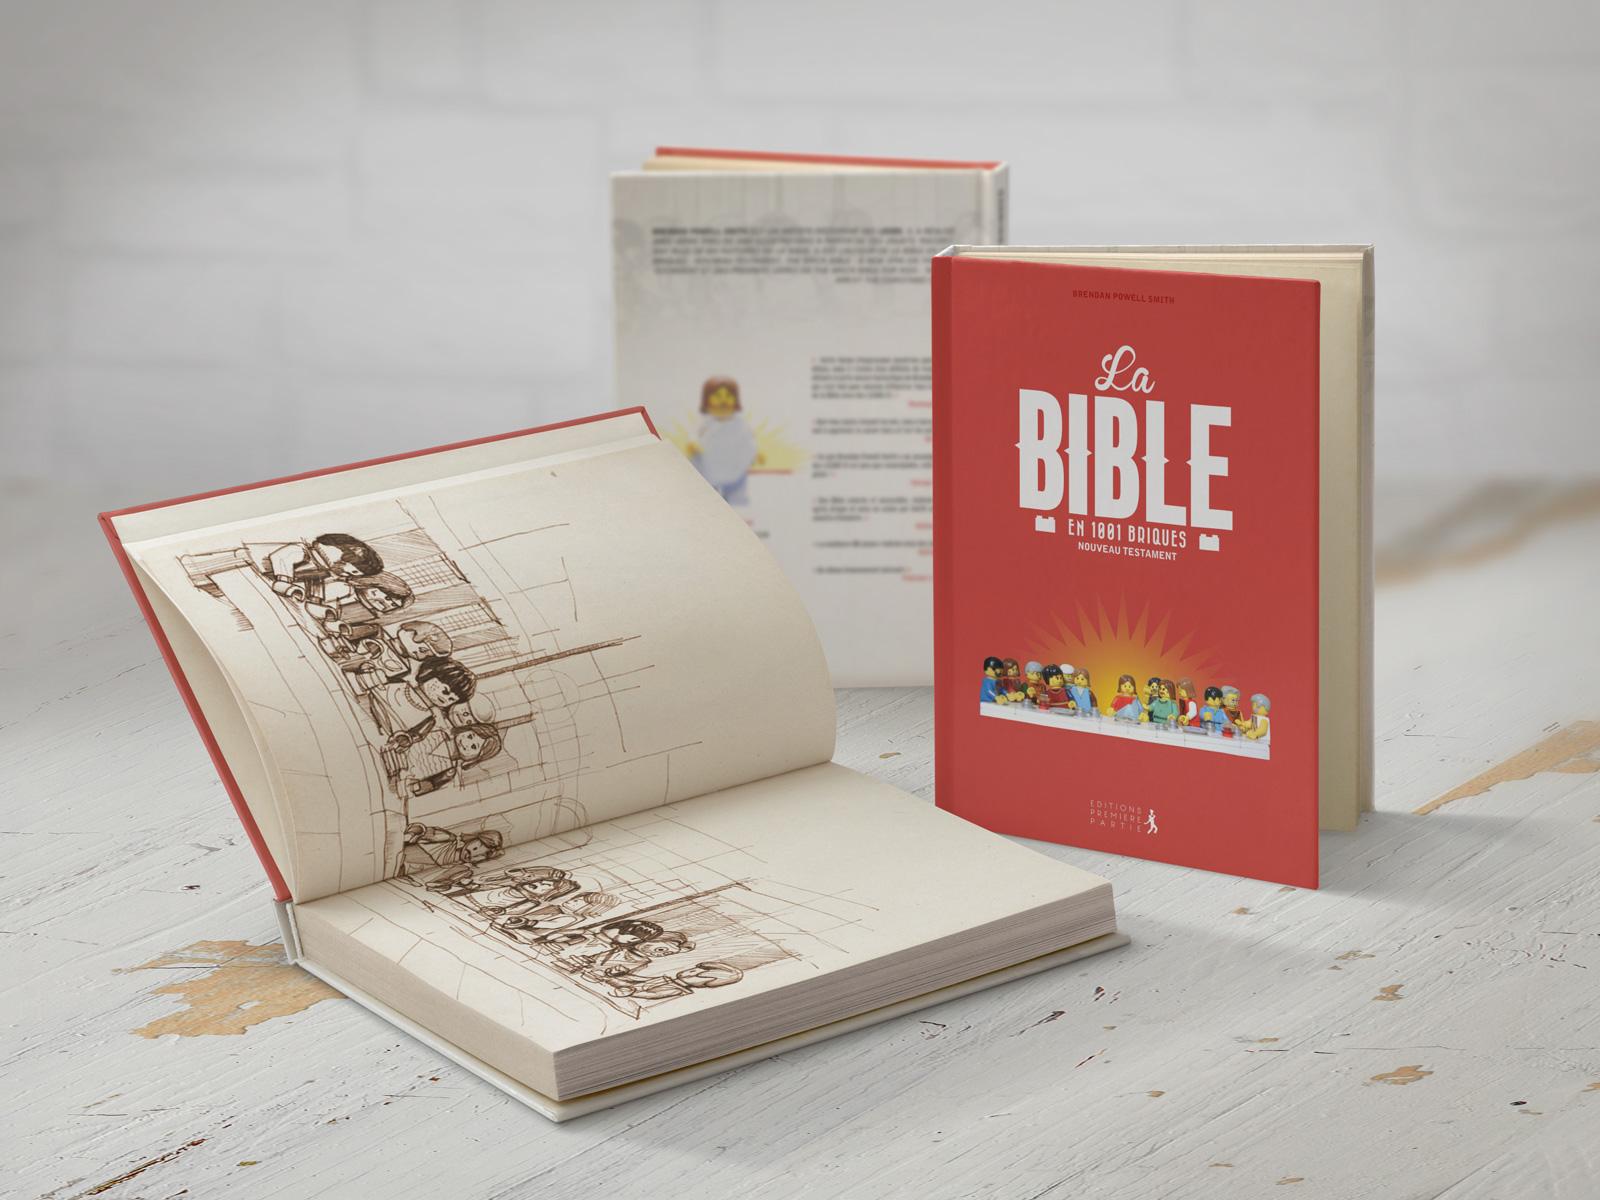 pp-bible-nt-01